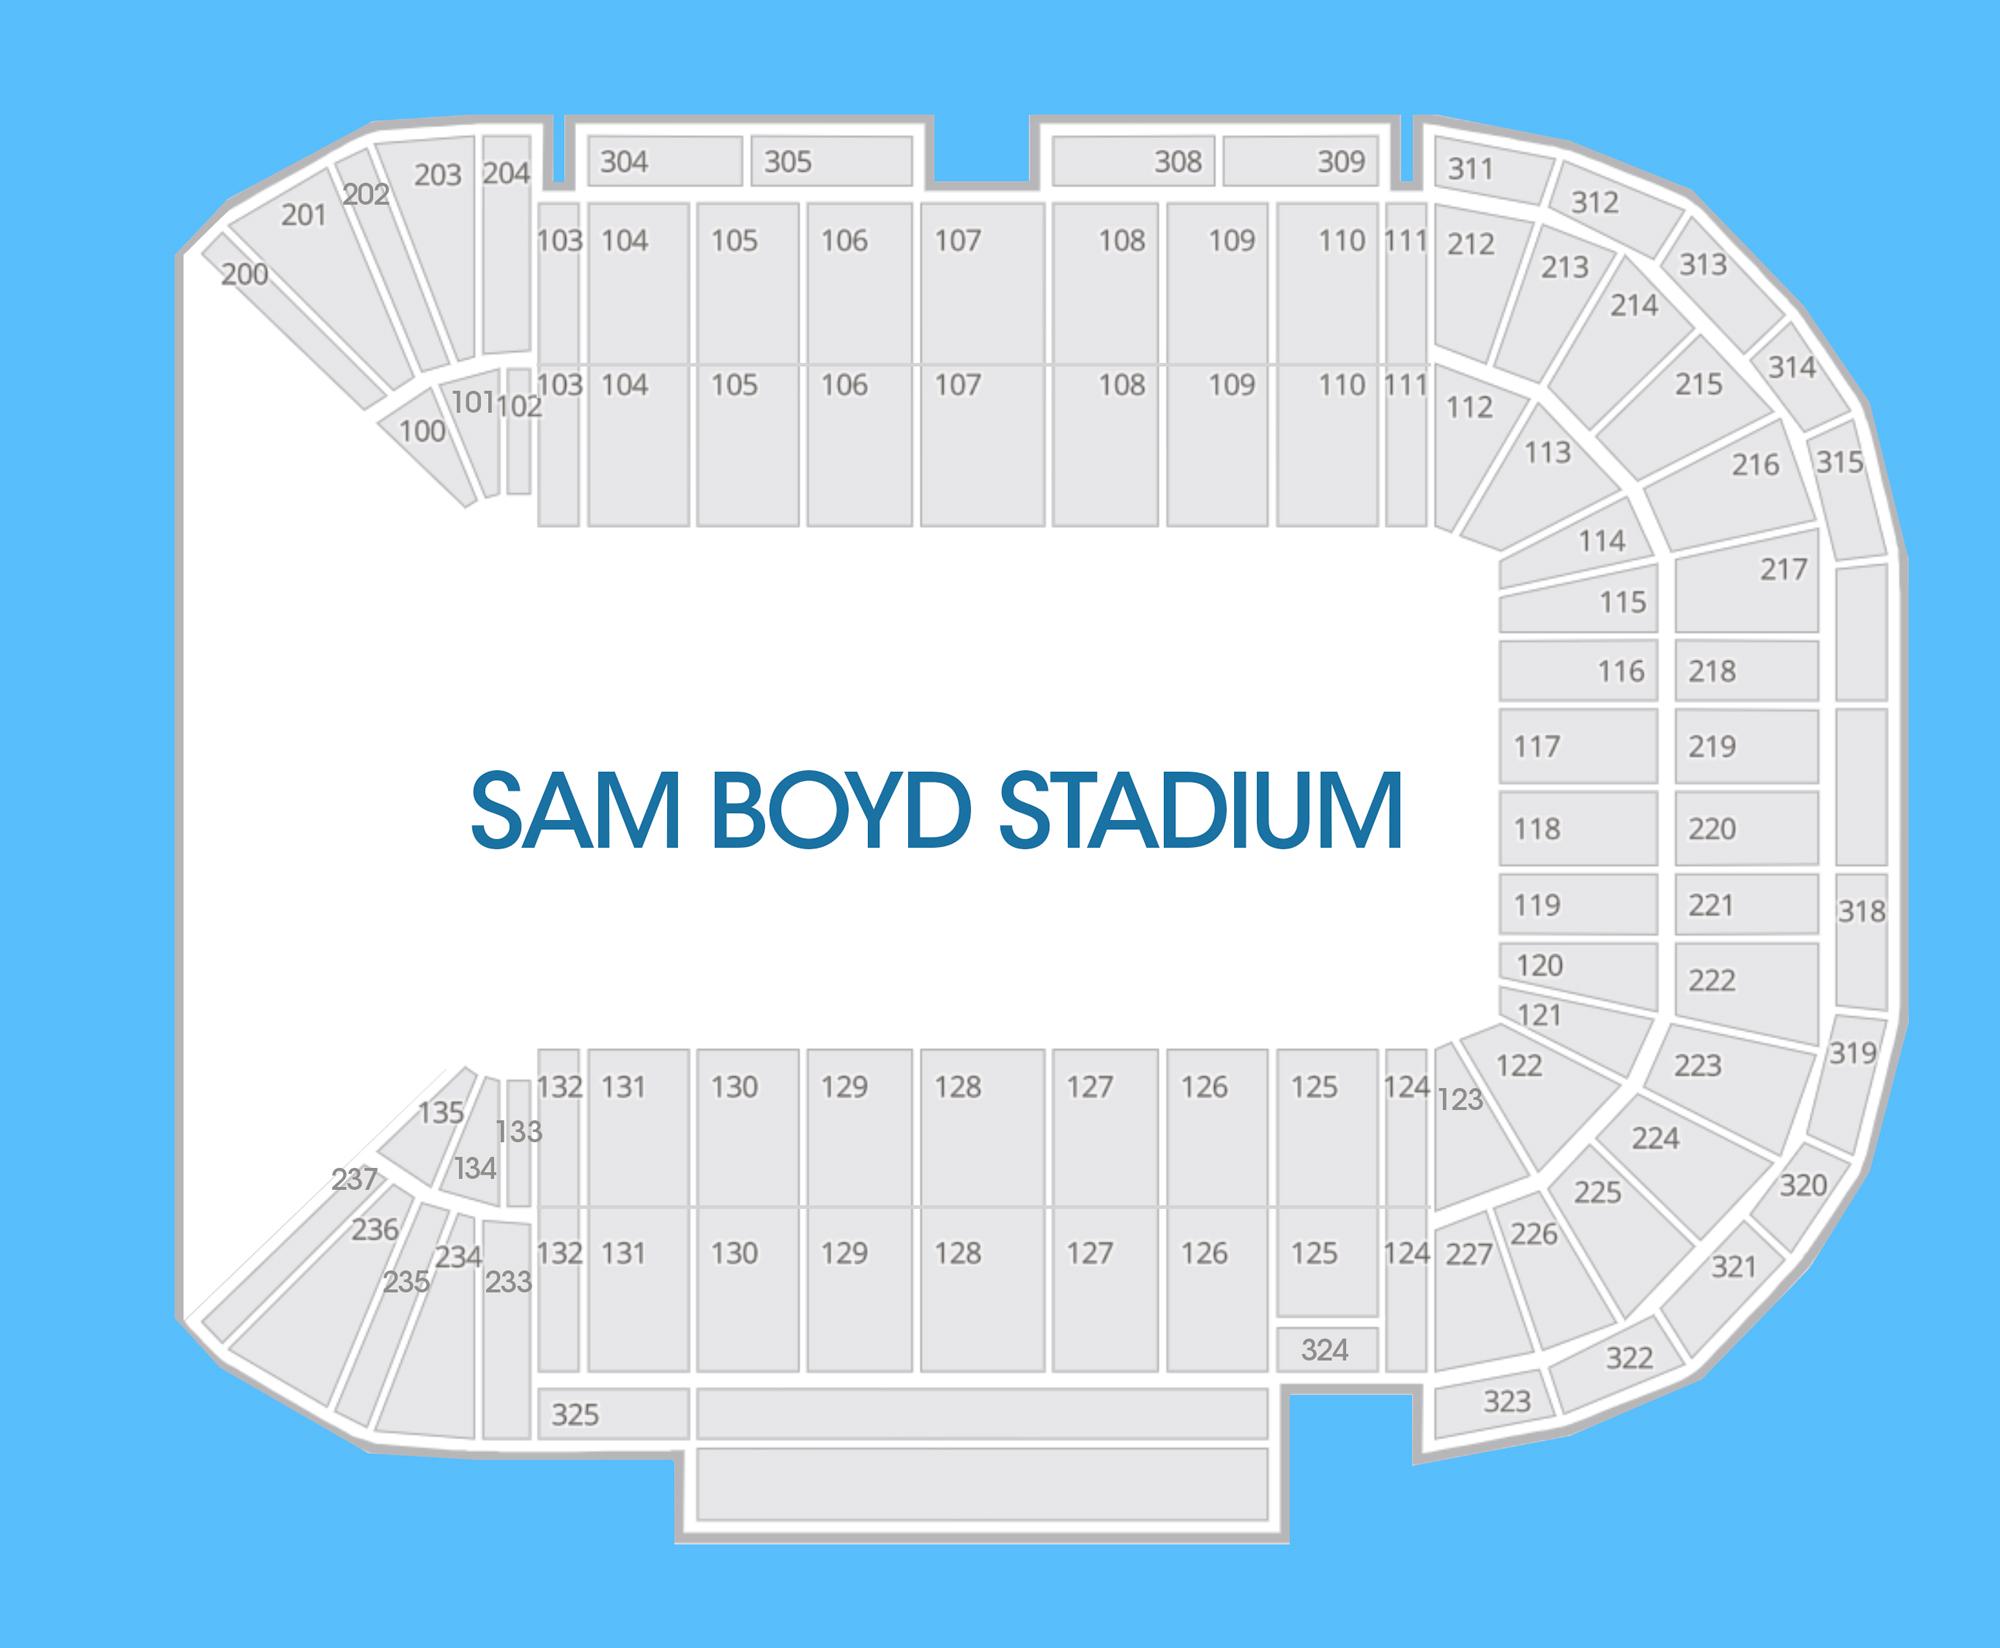 unlv interactive seating chart: Unlv interactive seating chart sam boyd stadium seating chart